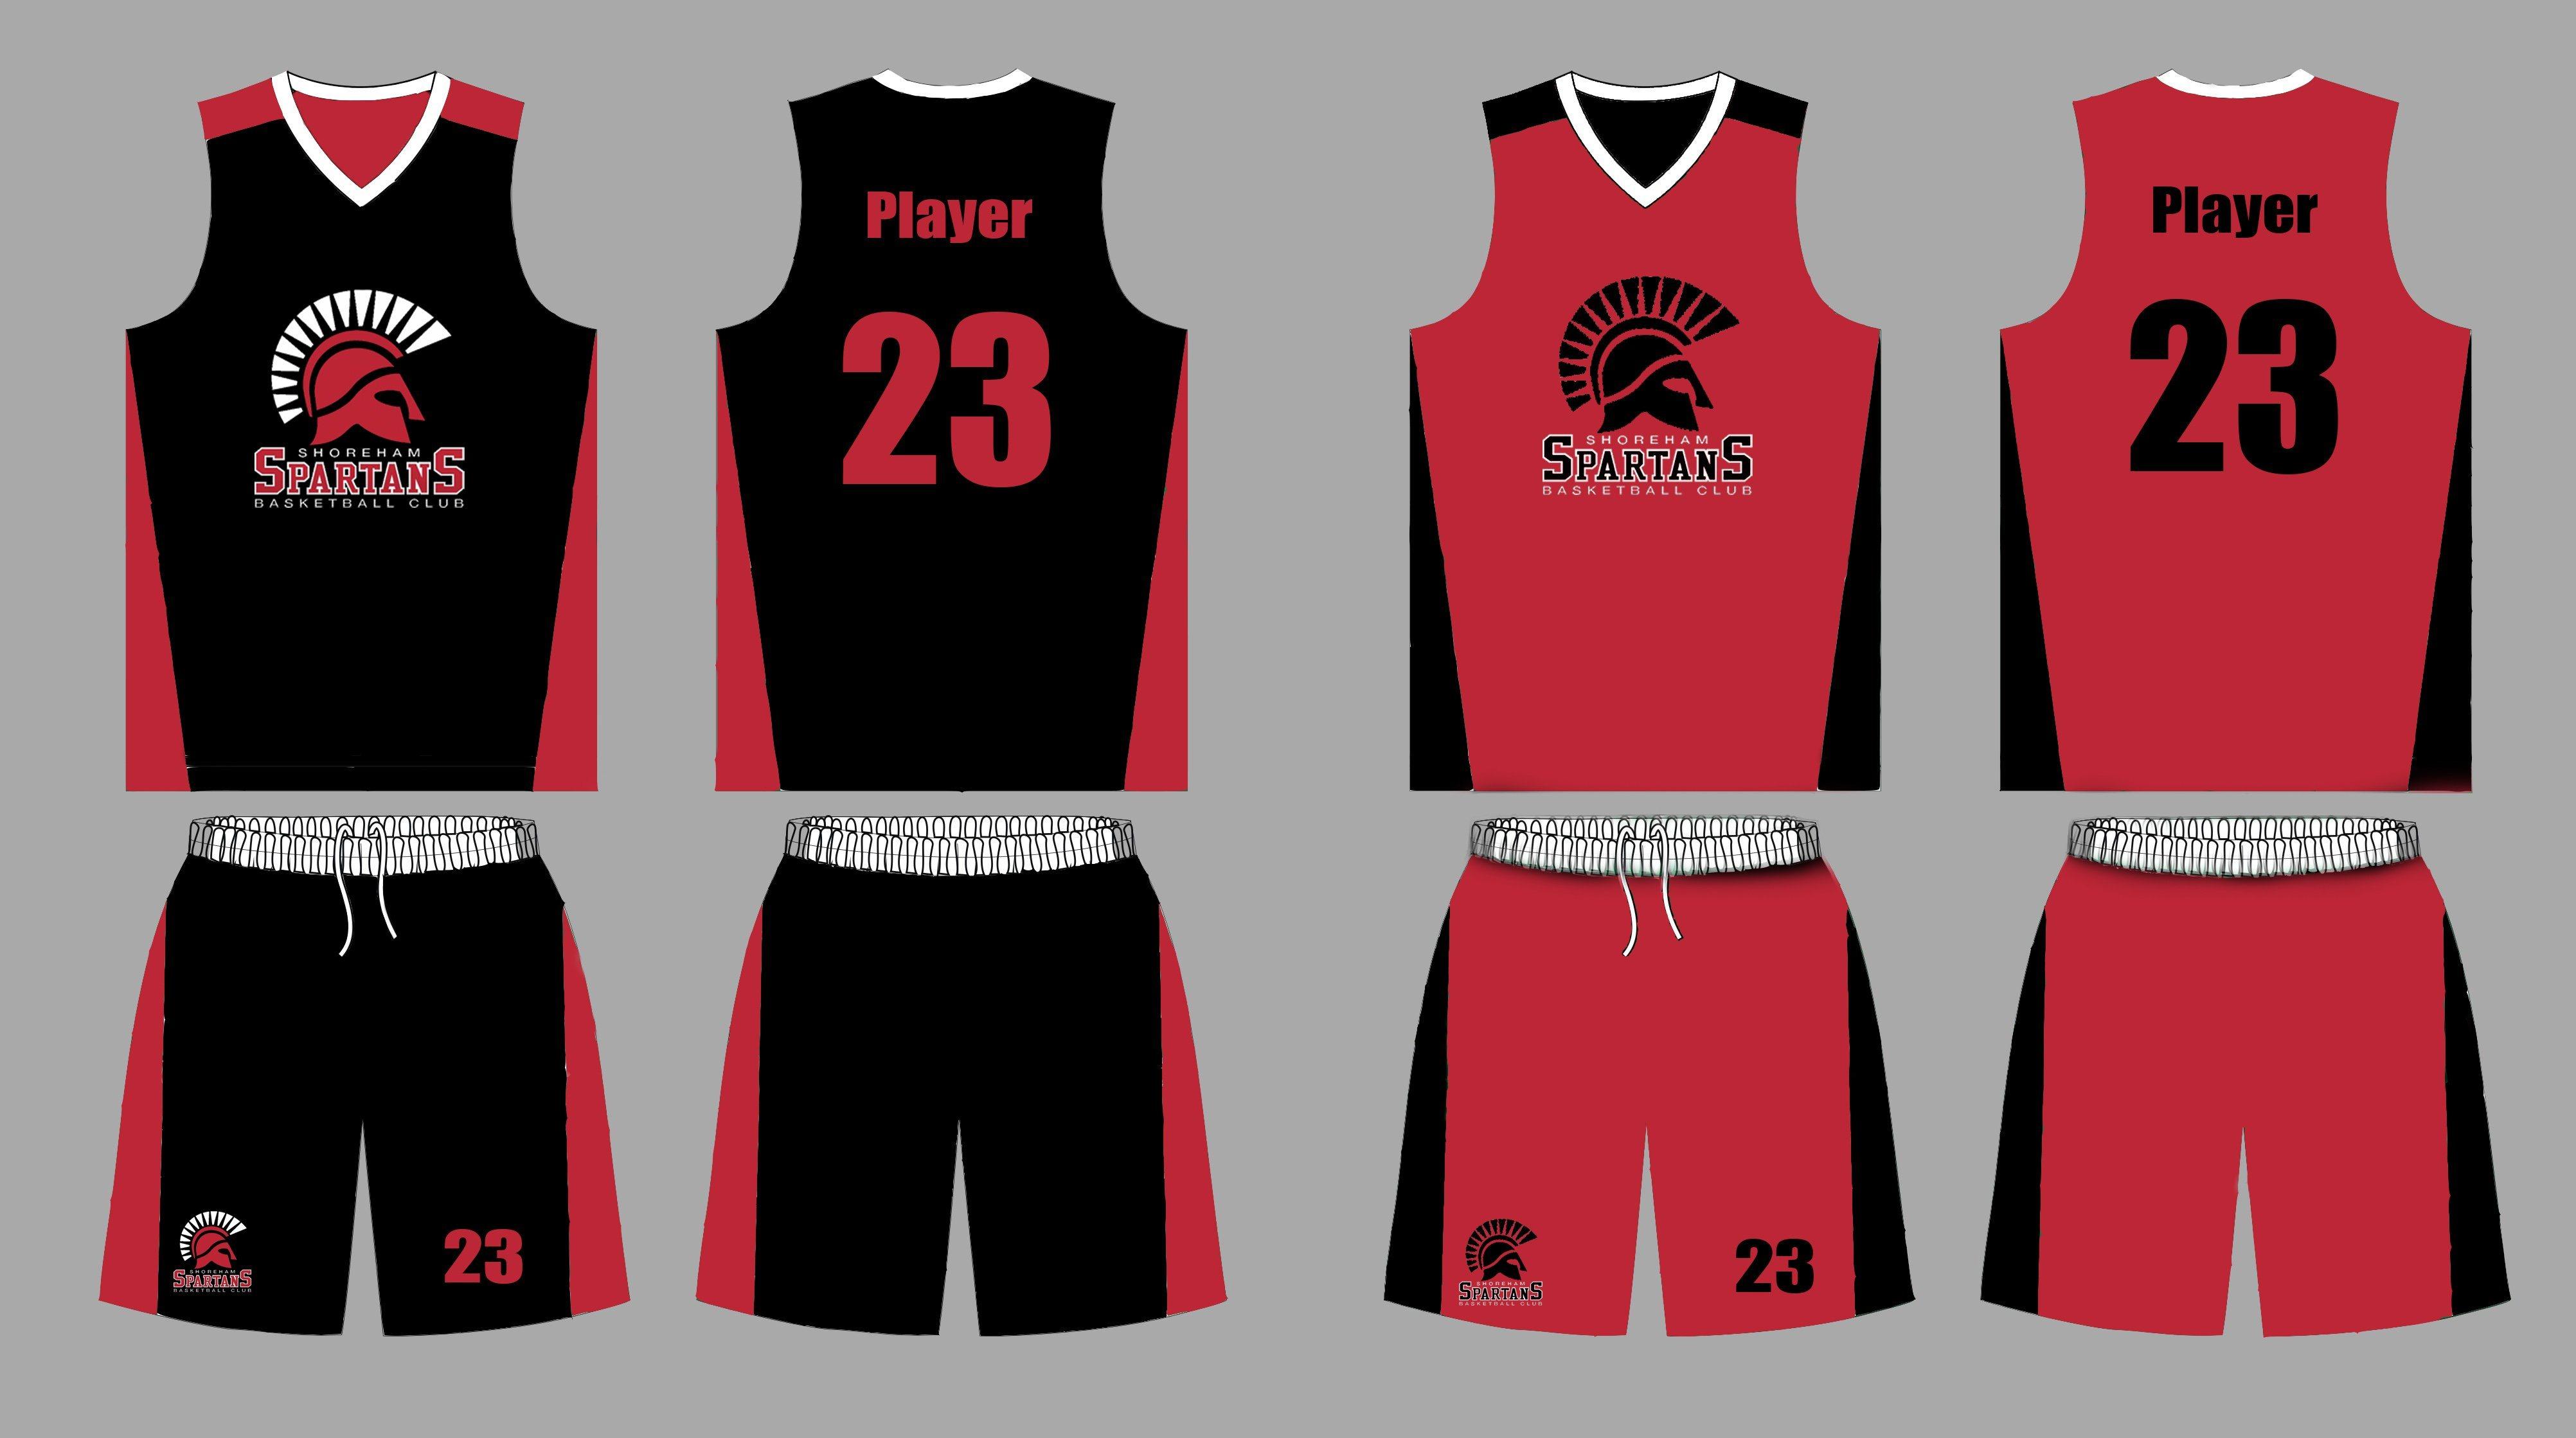 1e9ed779f ... a6cee6fc7 Custom Basketball Jerseys - Design Basketball Shirts Apparel  Online; 7785ac739 China Polyester Fabric Basketball Jersey; cb69ba346 Red  ...